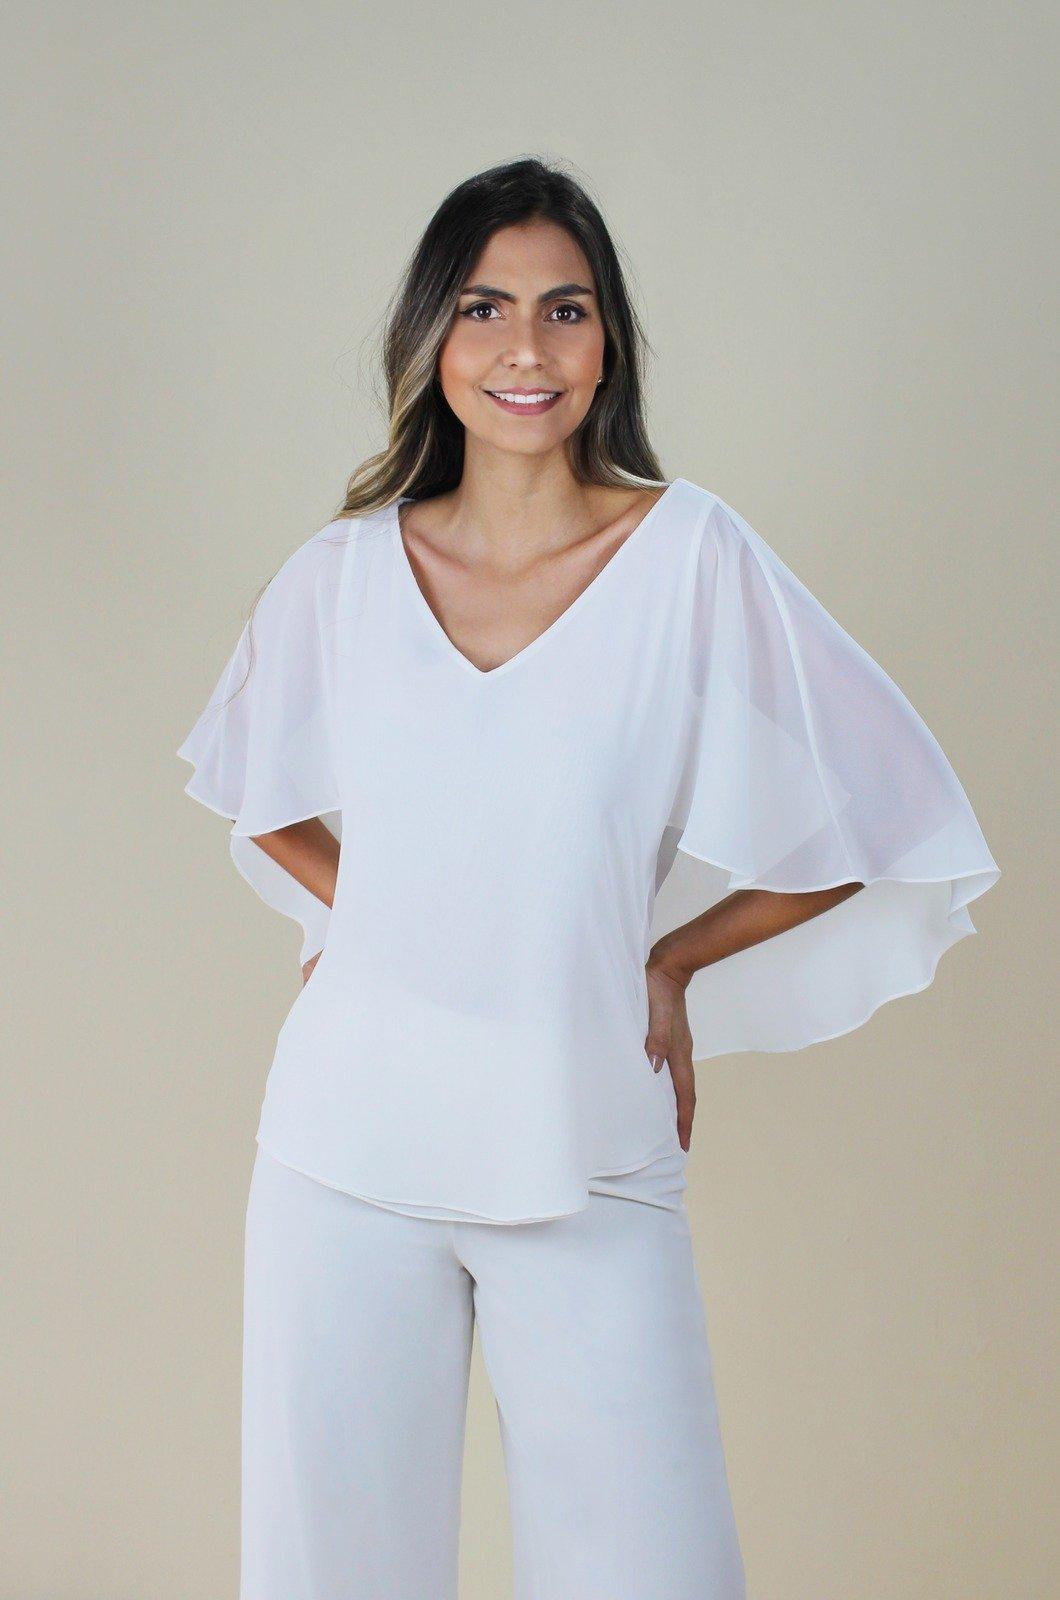 Blusa chiffon capa en espalda - Chazari 4982-20